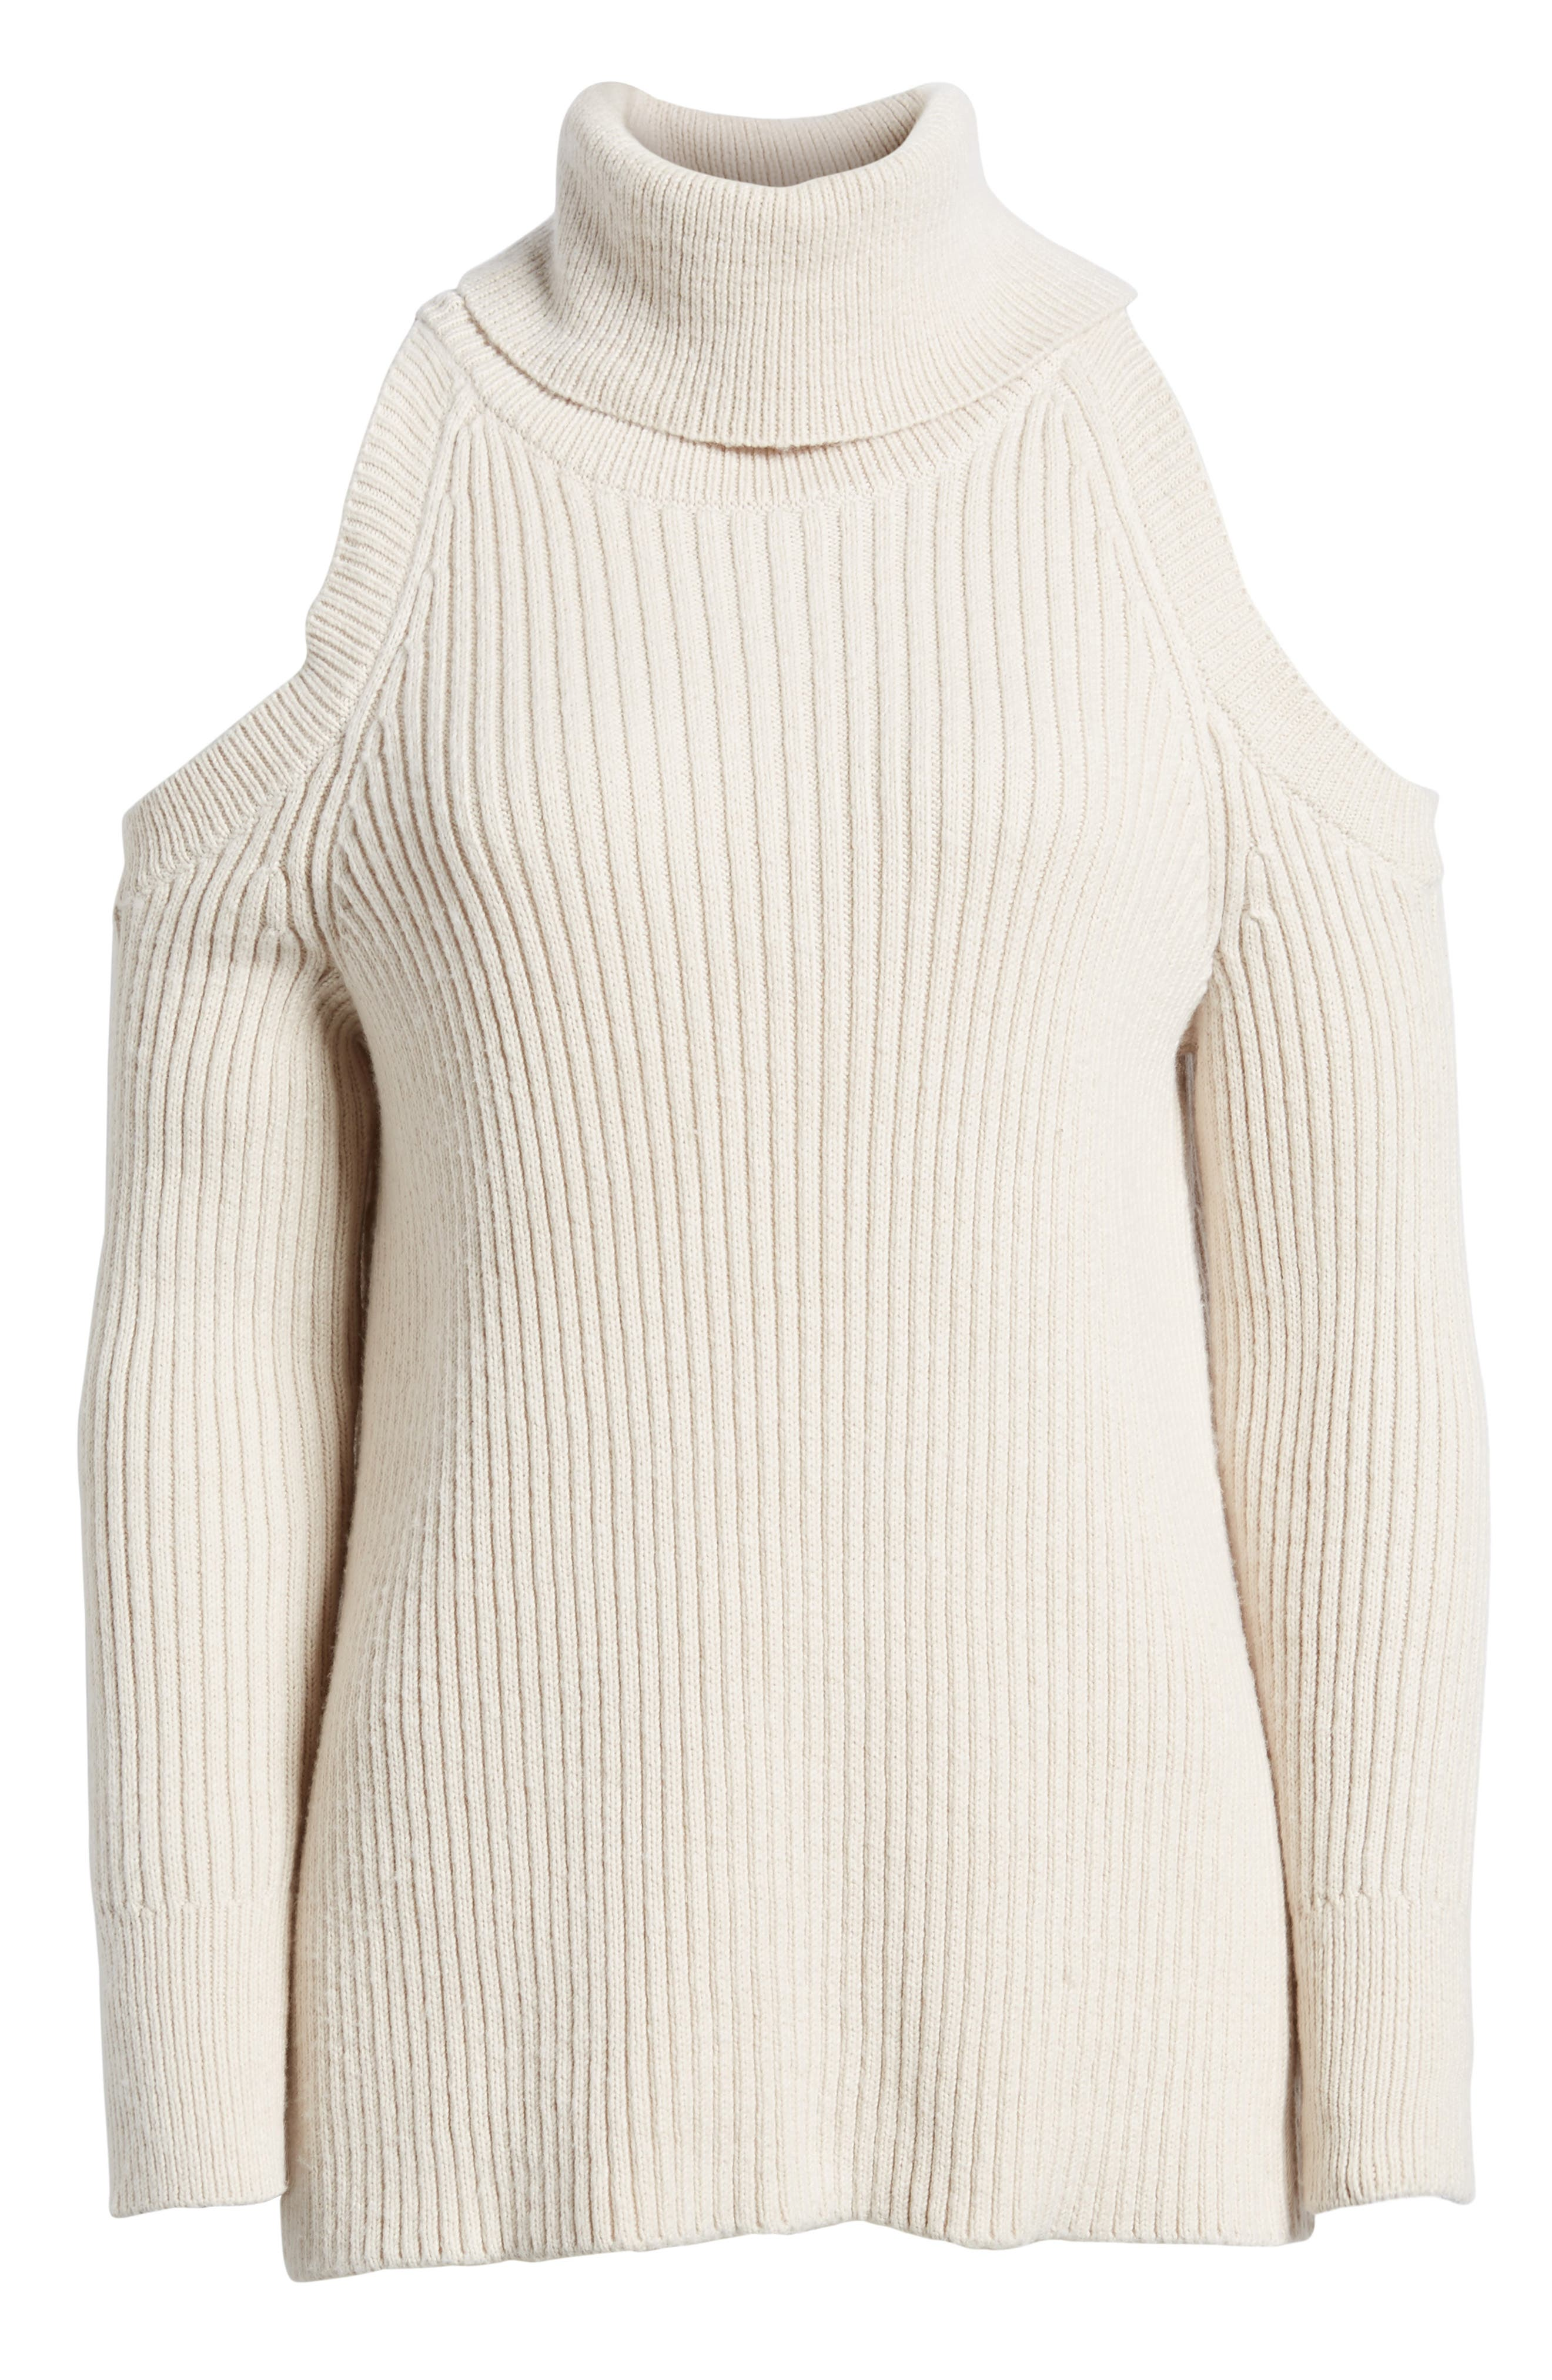 Rodell Cold Shoulder Sweater,                             Alternate thumbnail 12, color,